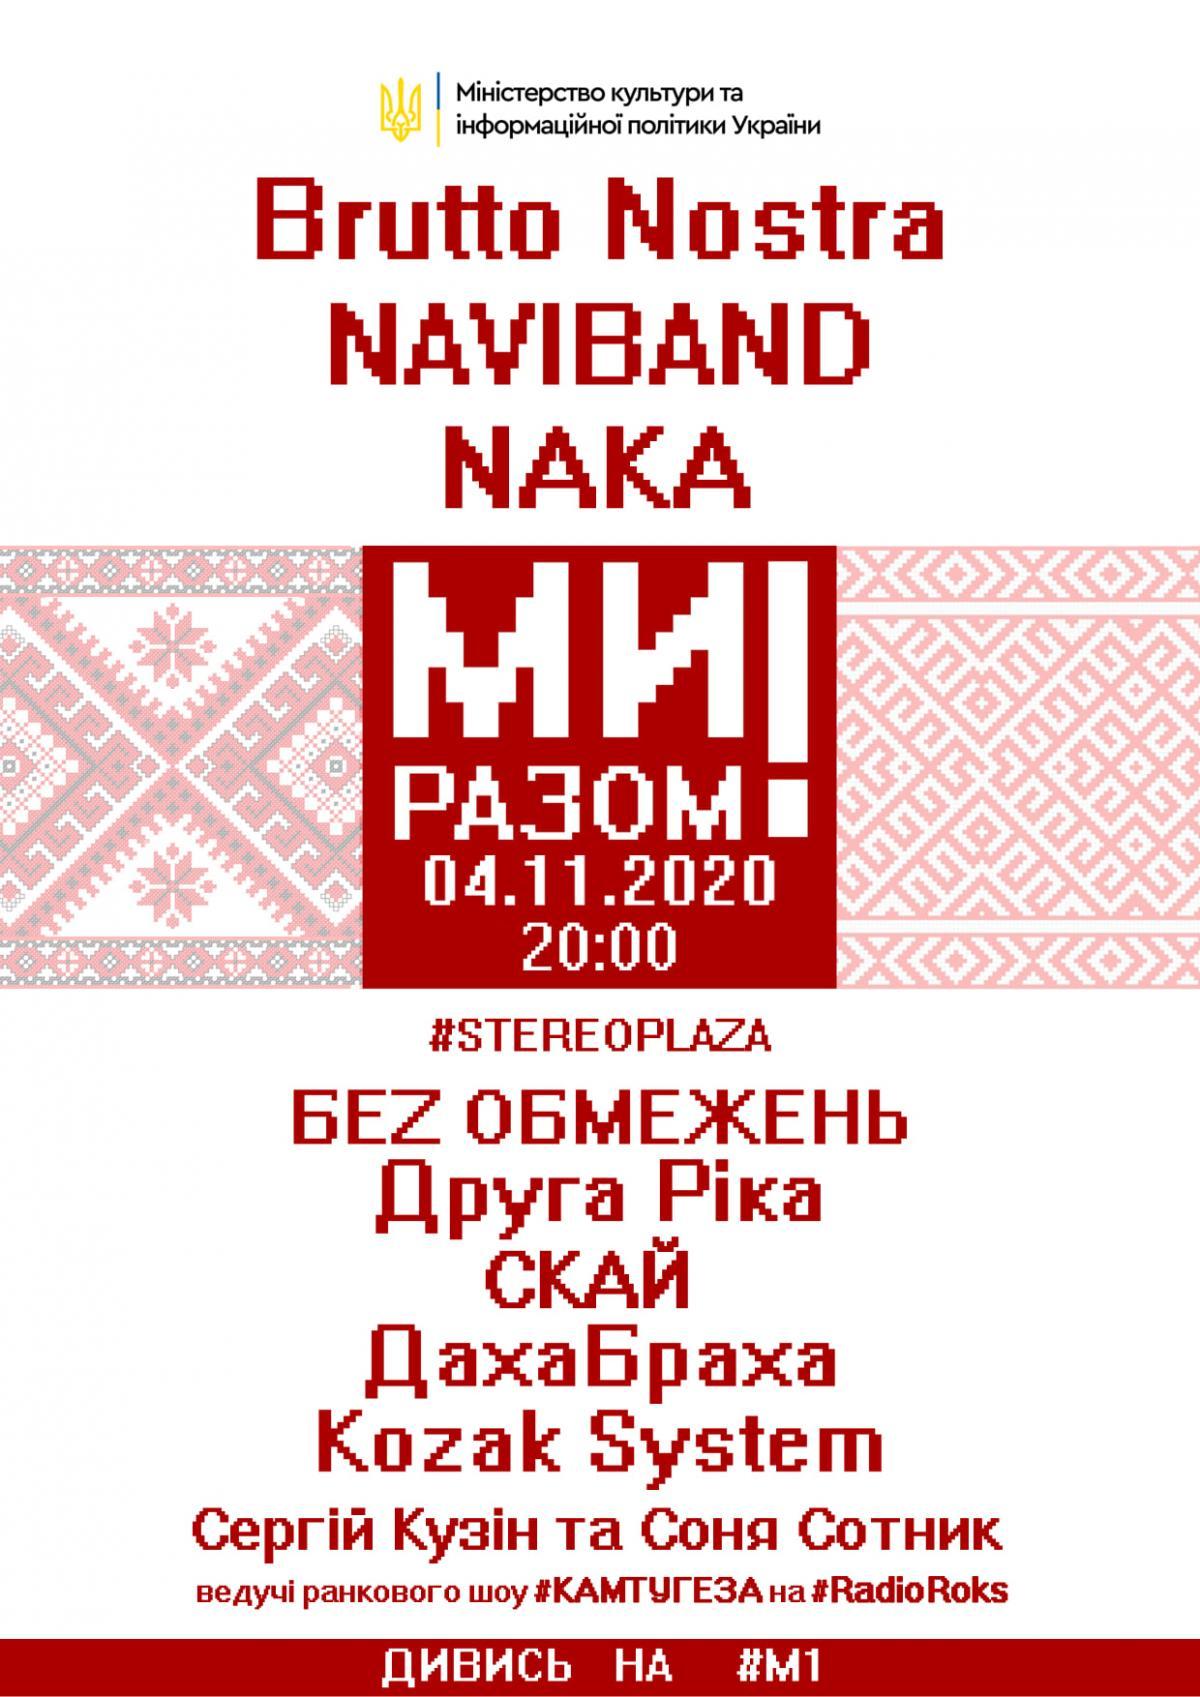 Музичний марафон Білорусь-Україна: